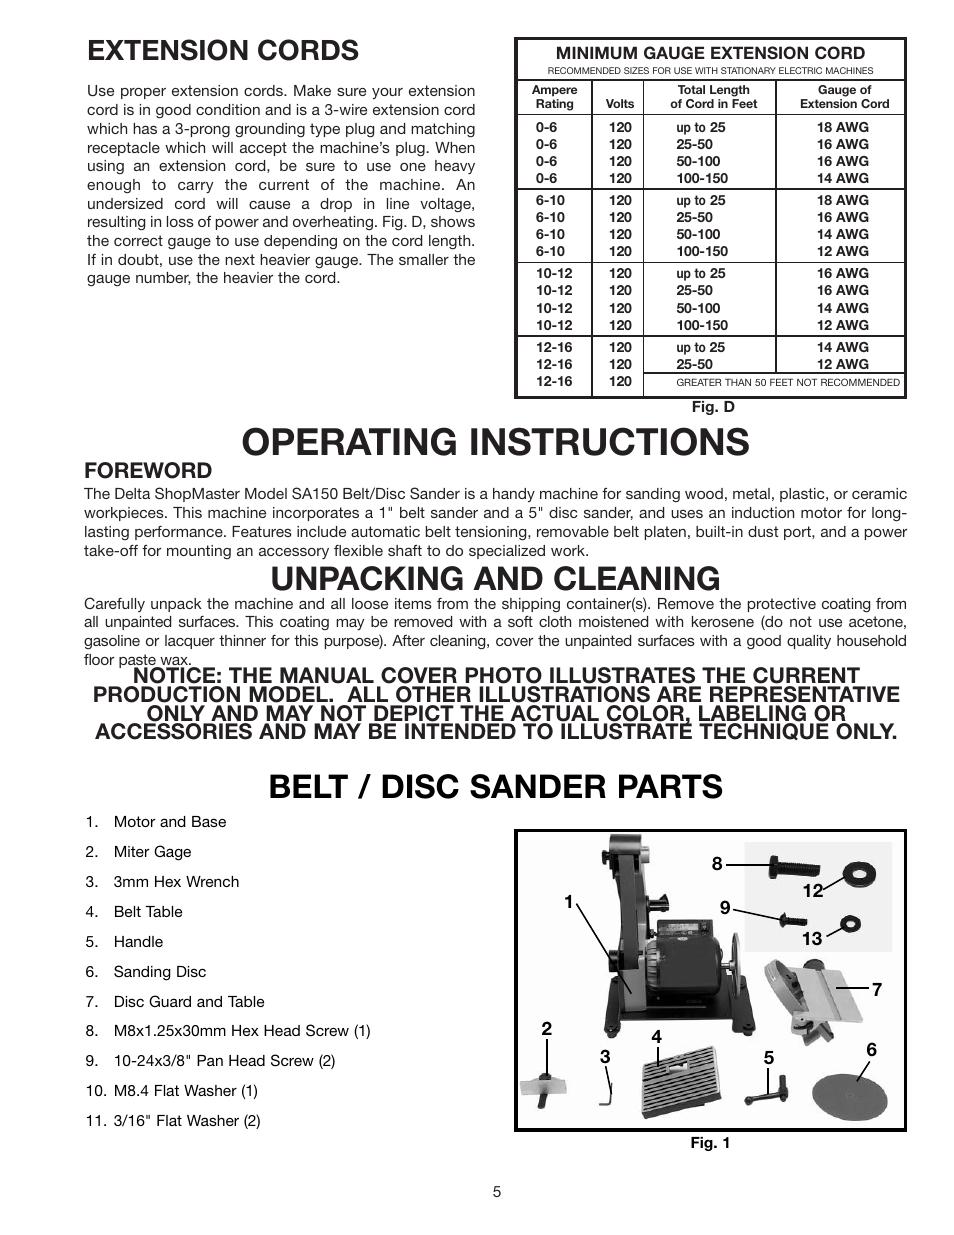 operating instructions unpacking and cleaning belt disc sander rh manualsdir com